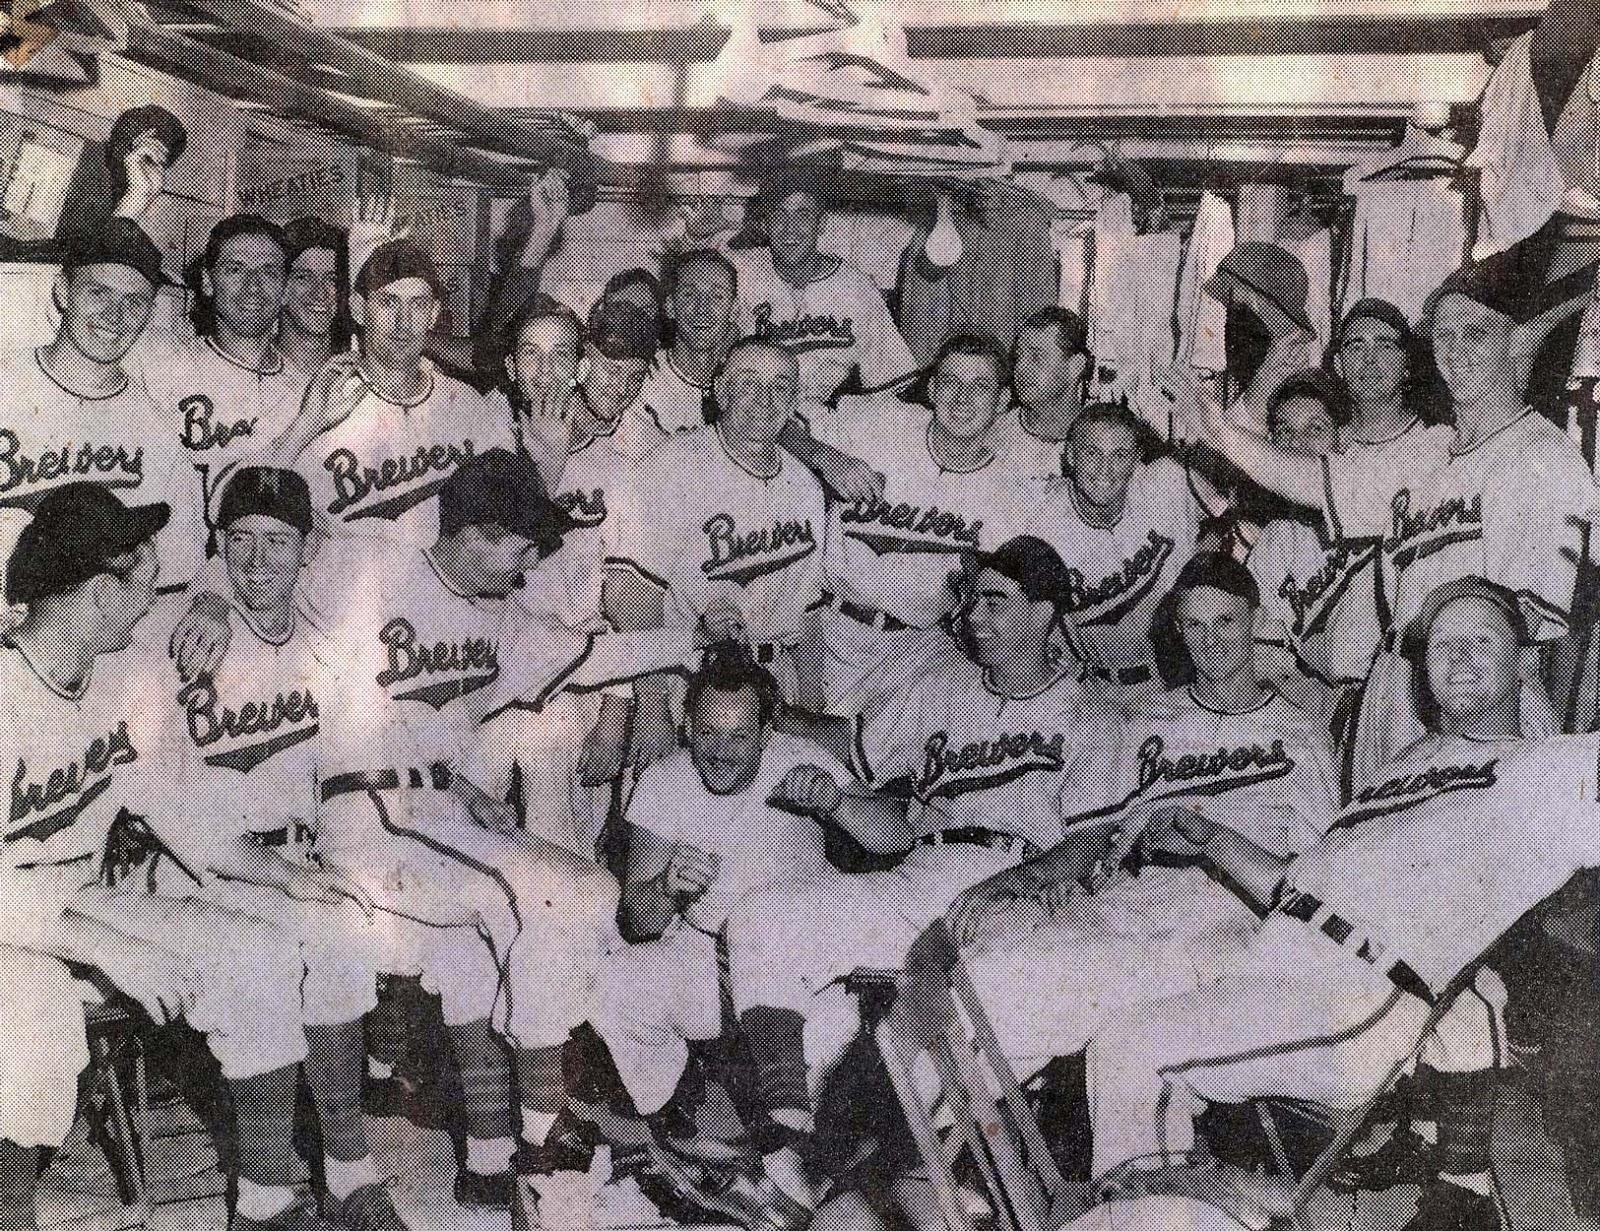 Milwaukee Brewers, 1944